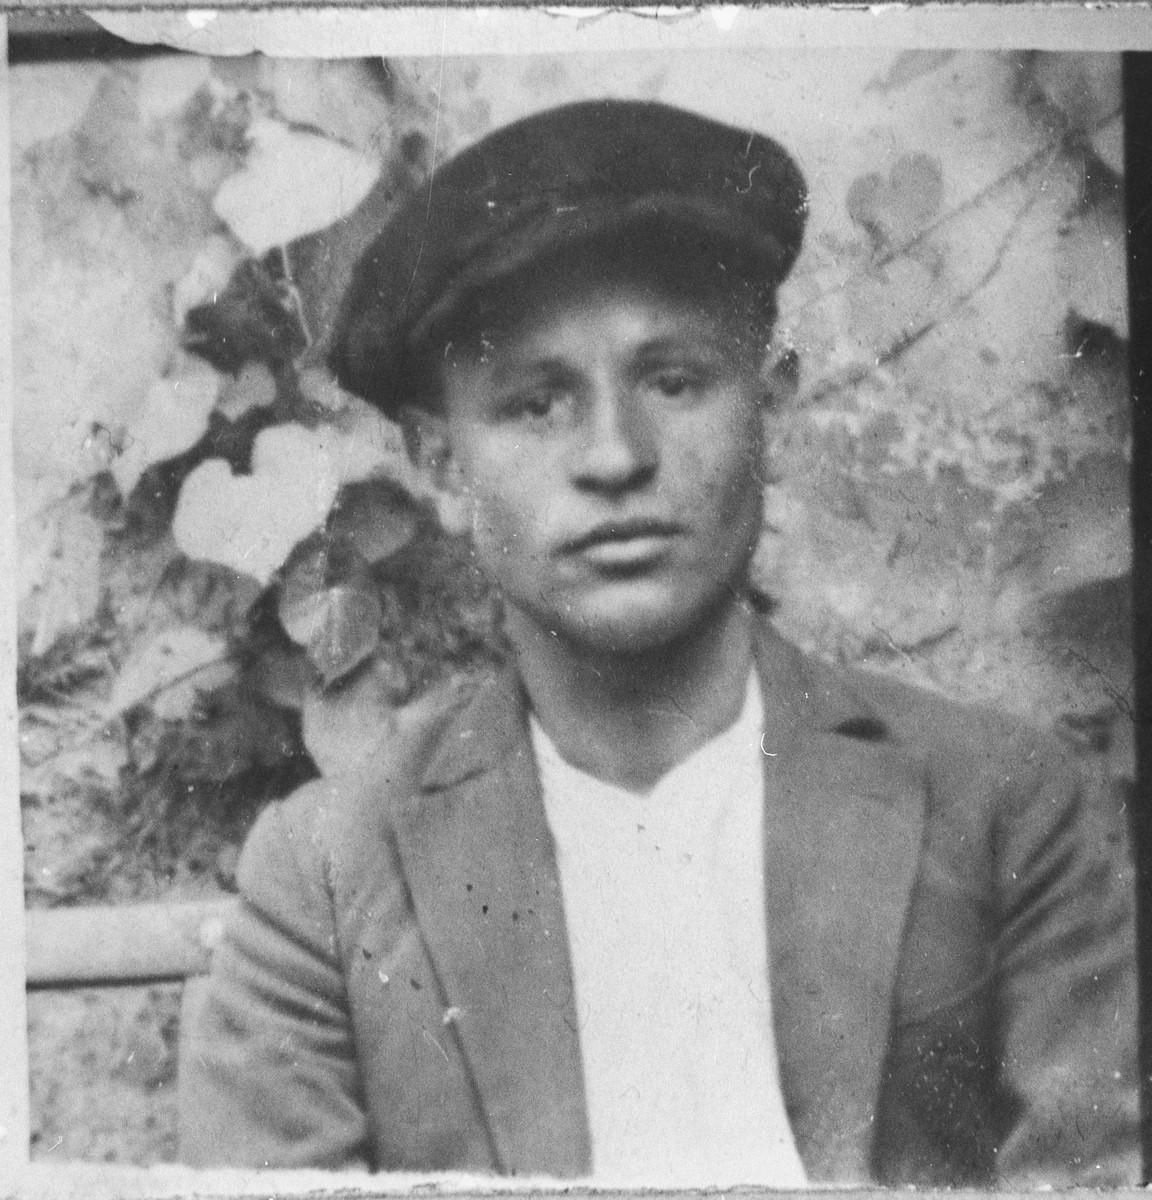 Portrait of Samuel Alba, son of Yakov Alba.